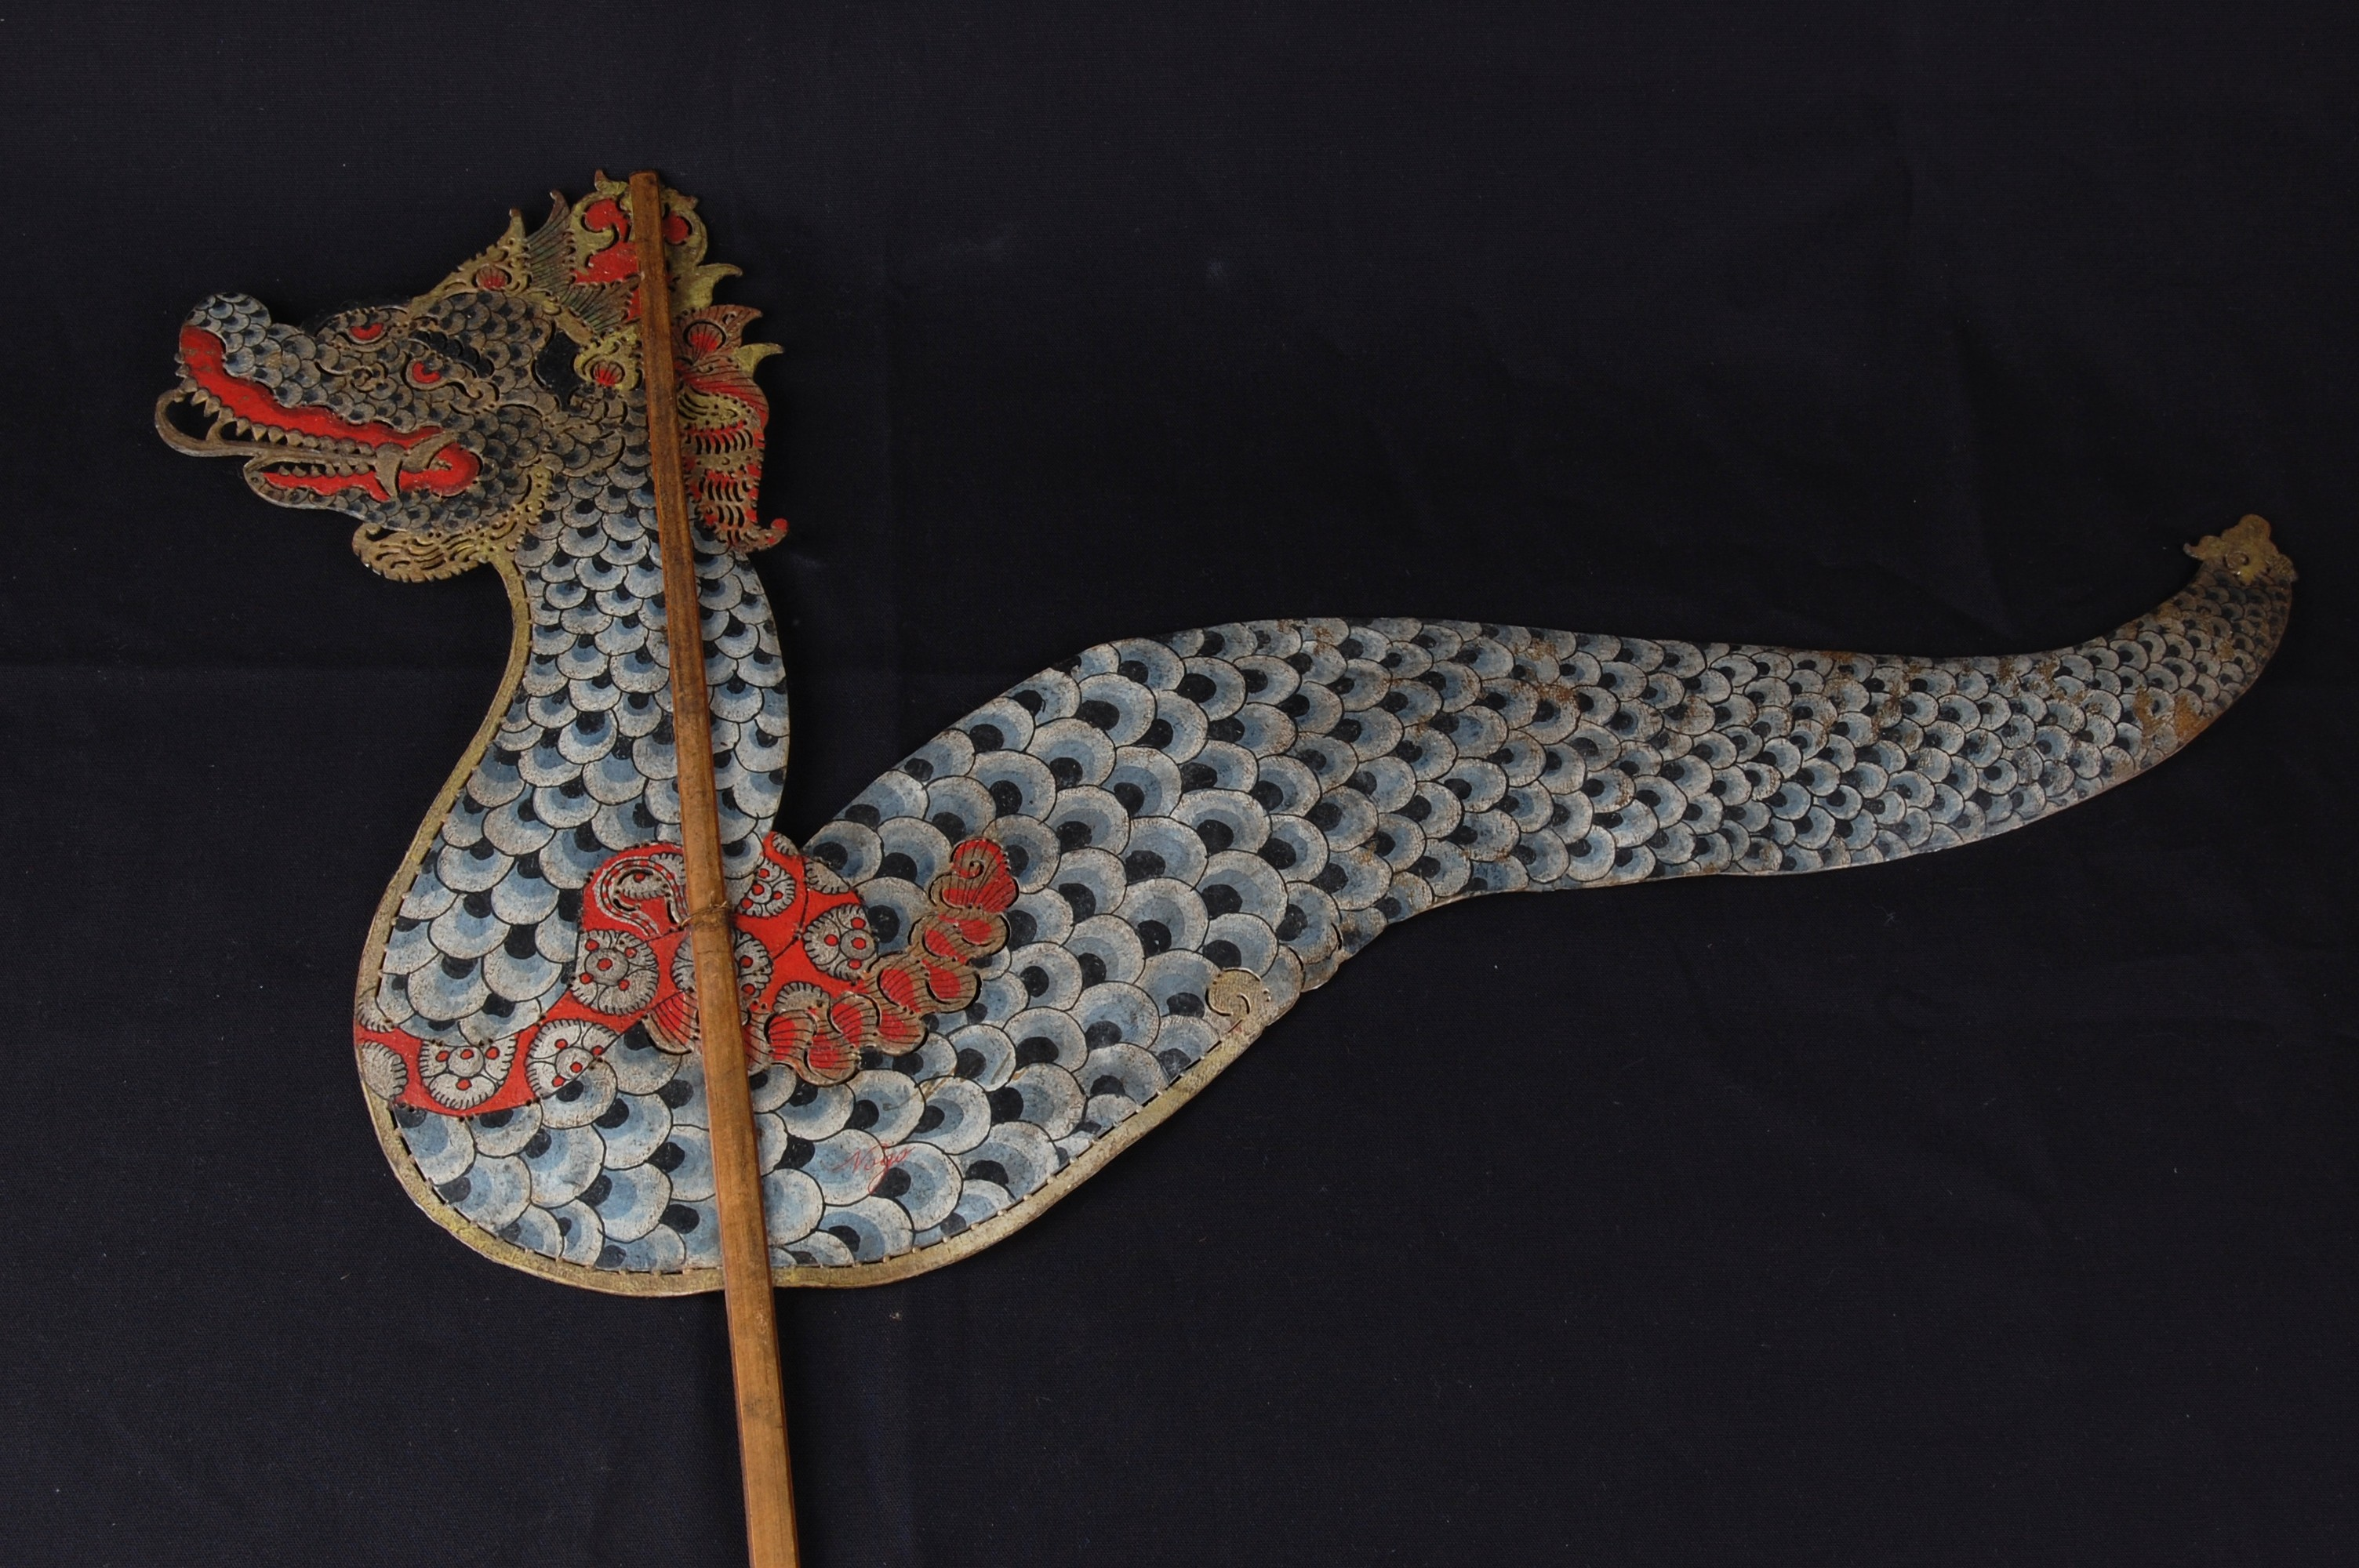 javanese-mythical-serpent